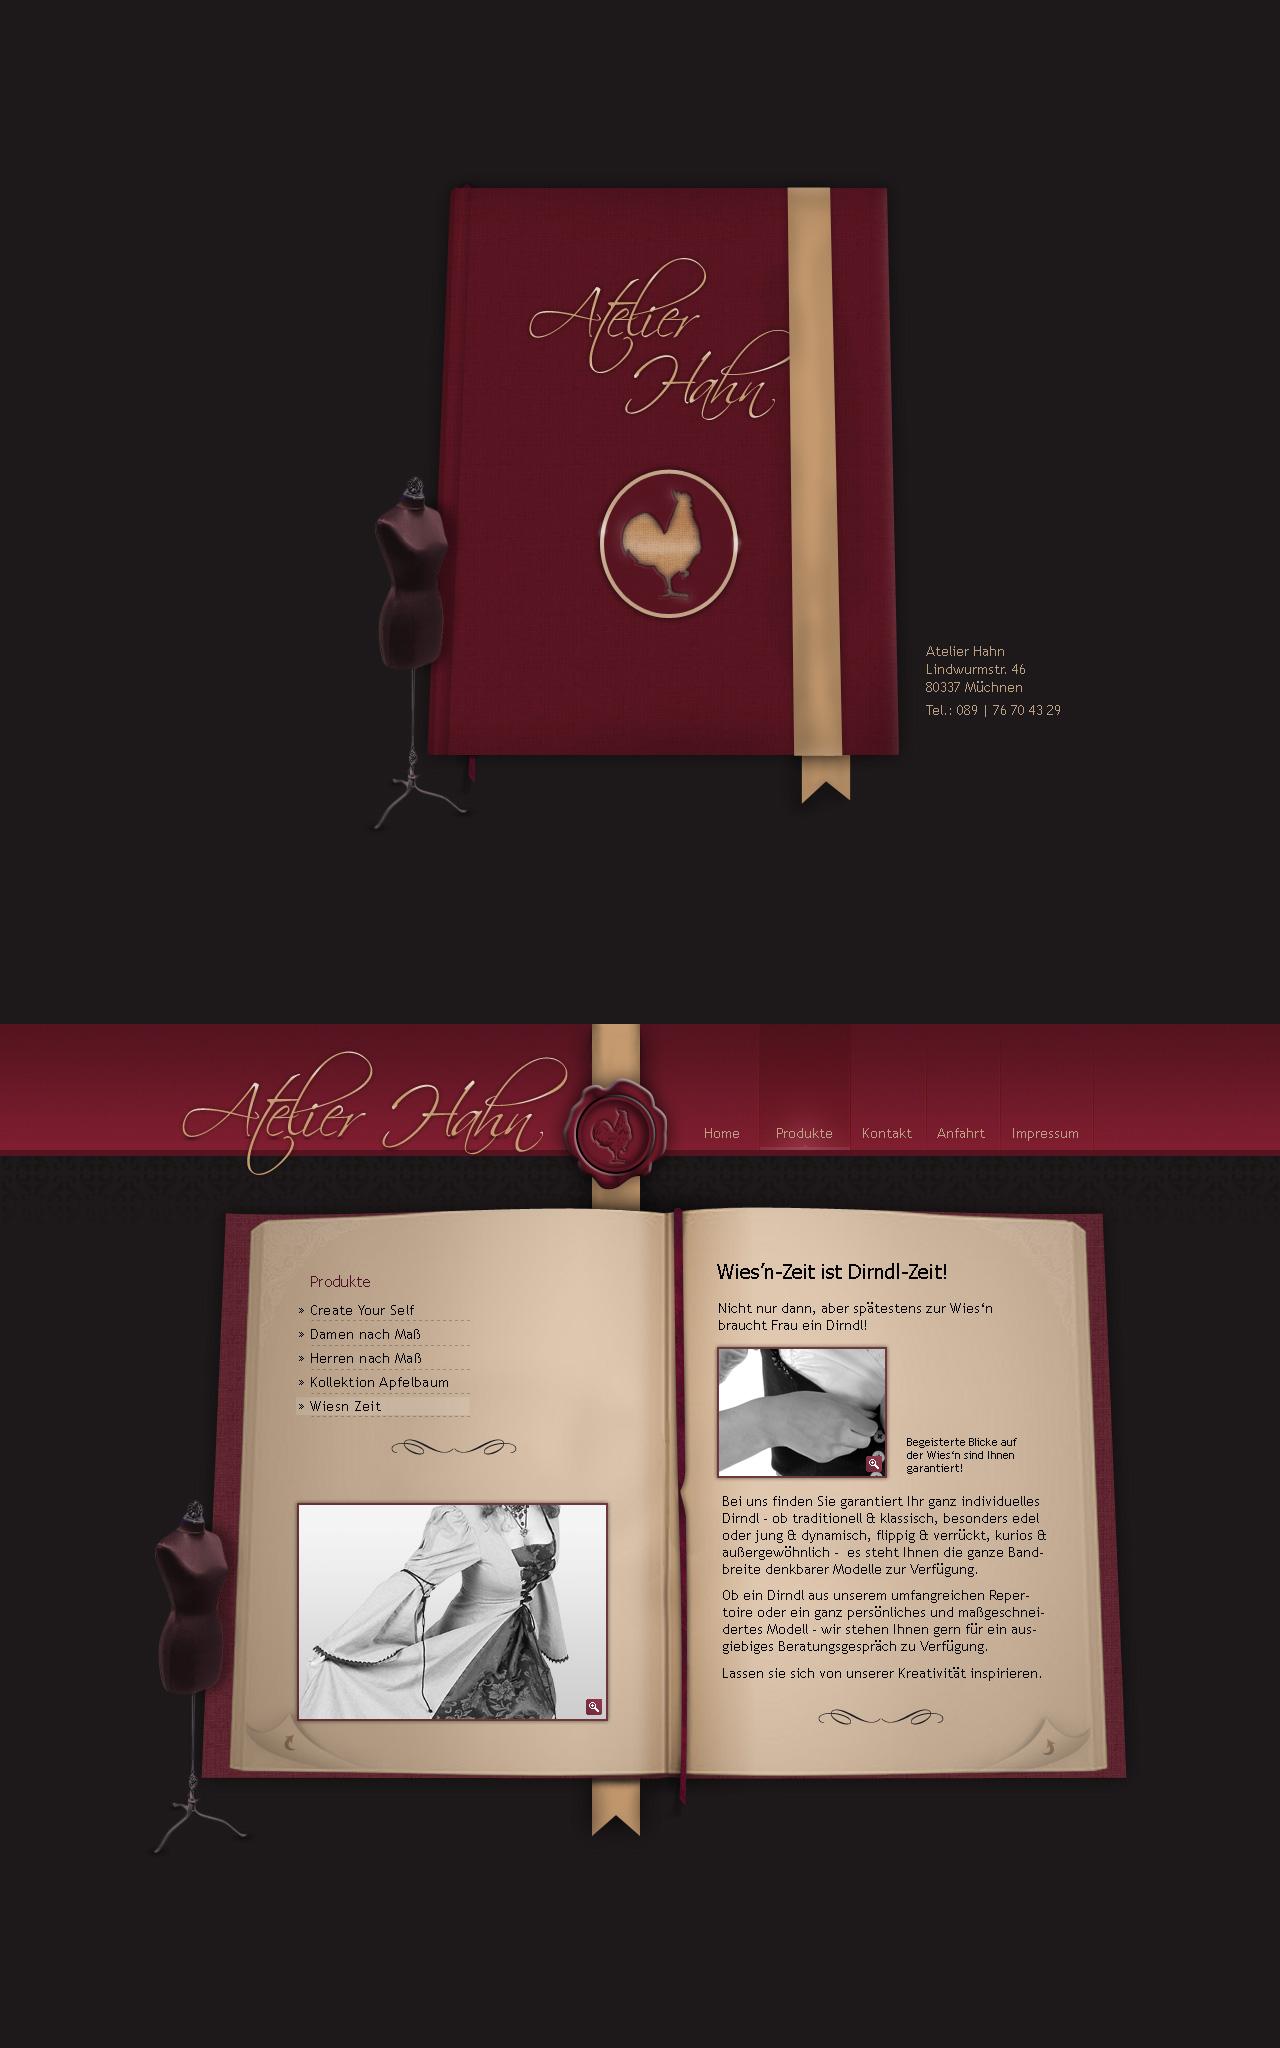 Tailorstudio - Website by medienvirus